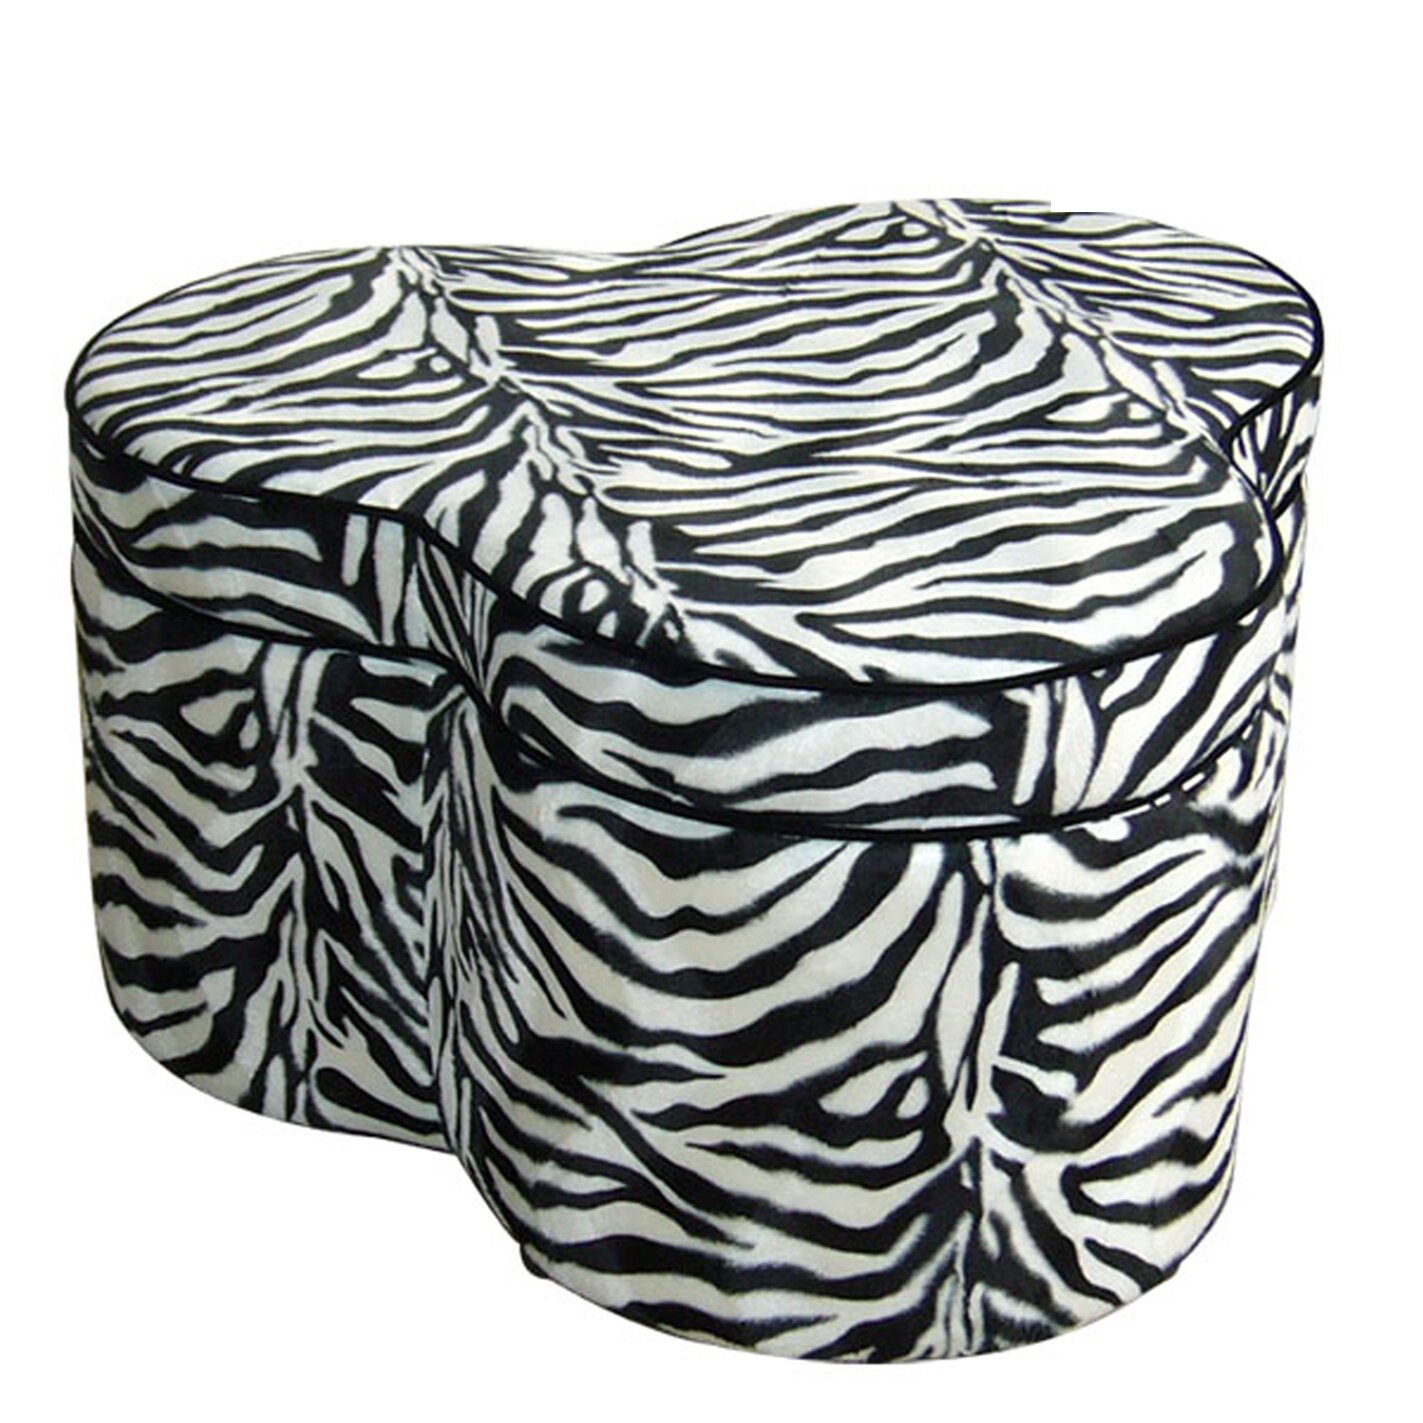 ORE Furniture Zebra Storage Ottoman with Seating - ORE Furniture Zebra Storage Ottoman With Seating & Reviews Wayfair